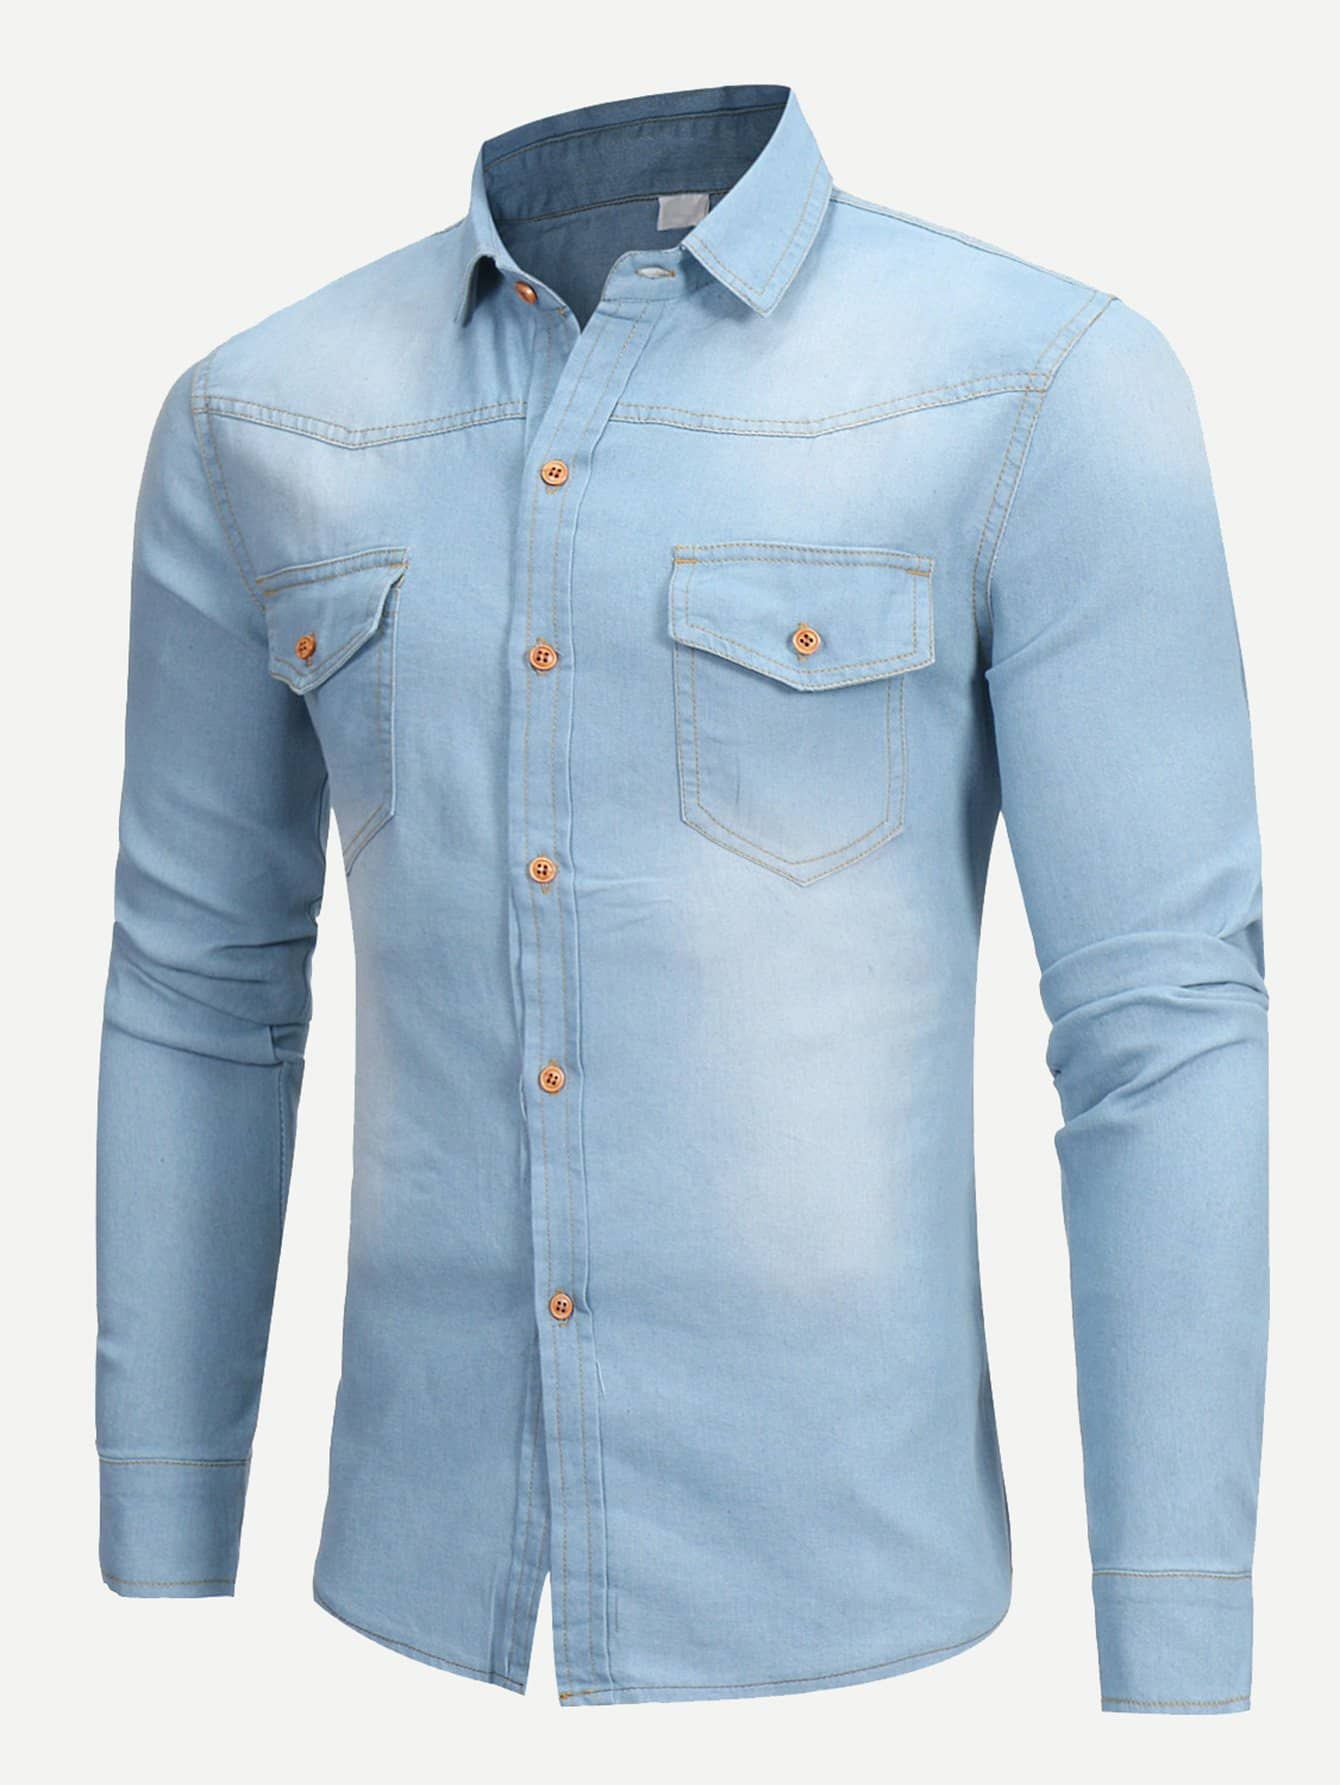 Men Wish Plain Denim Blouse kids plain denim blouse